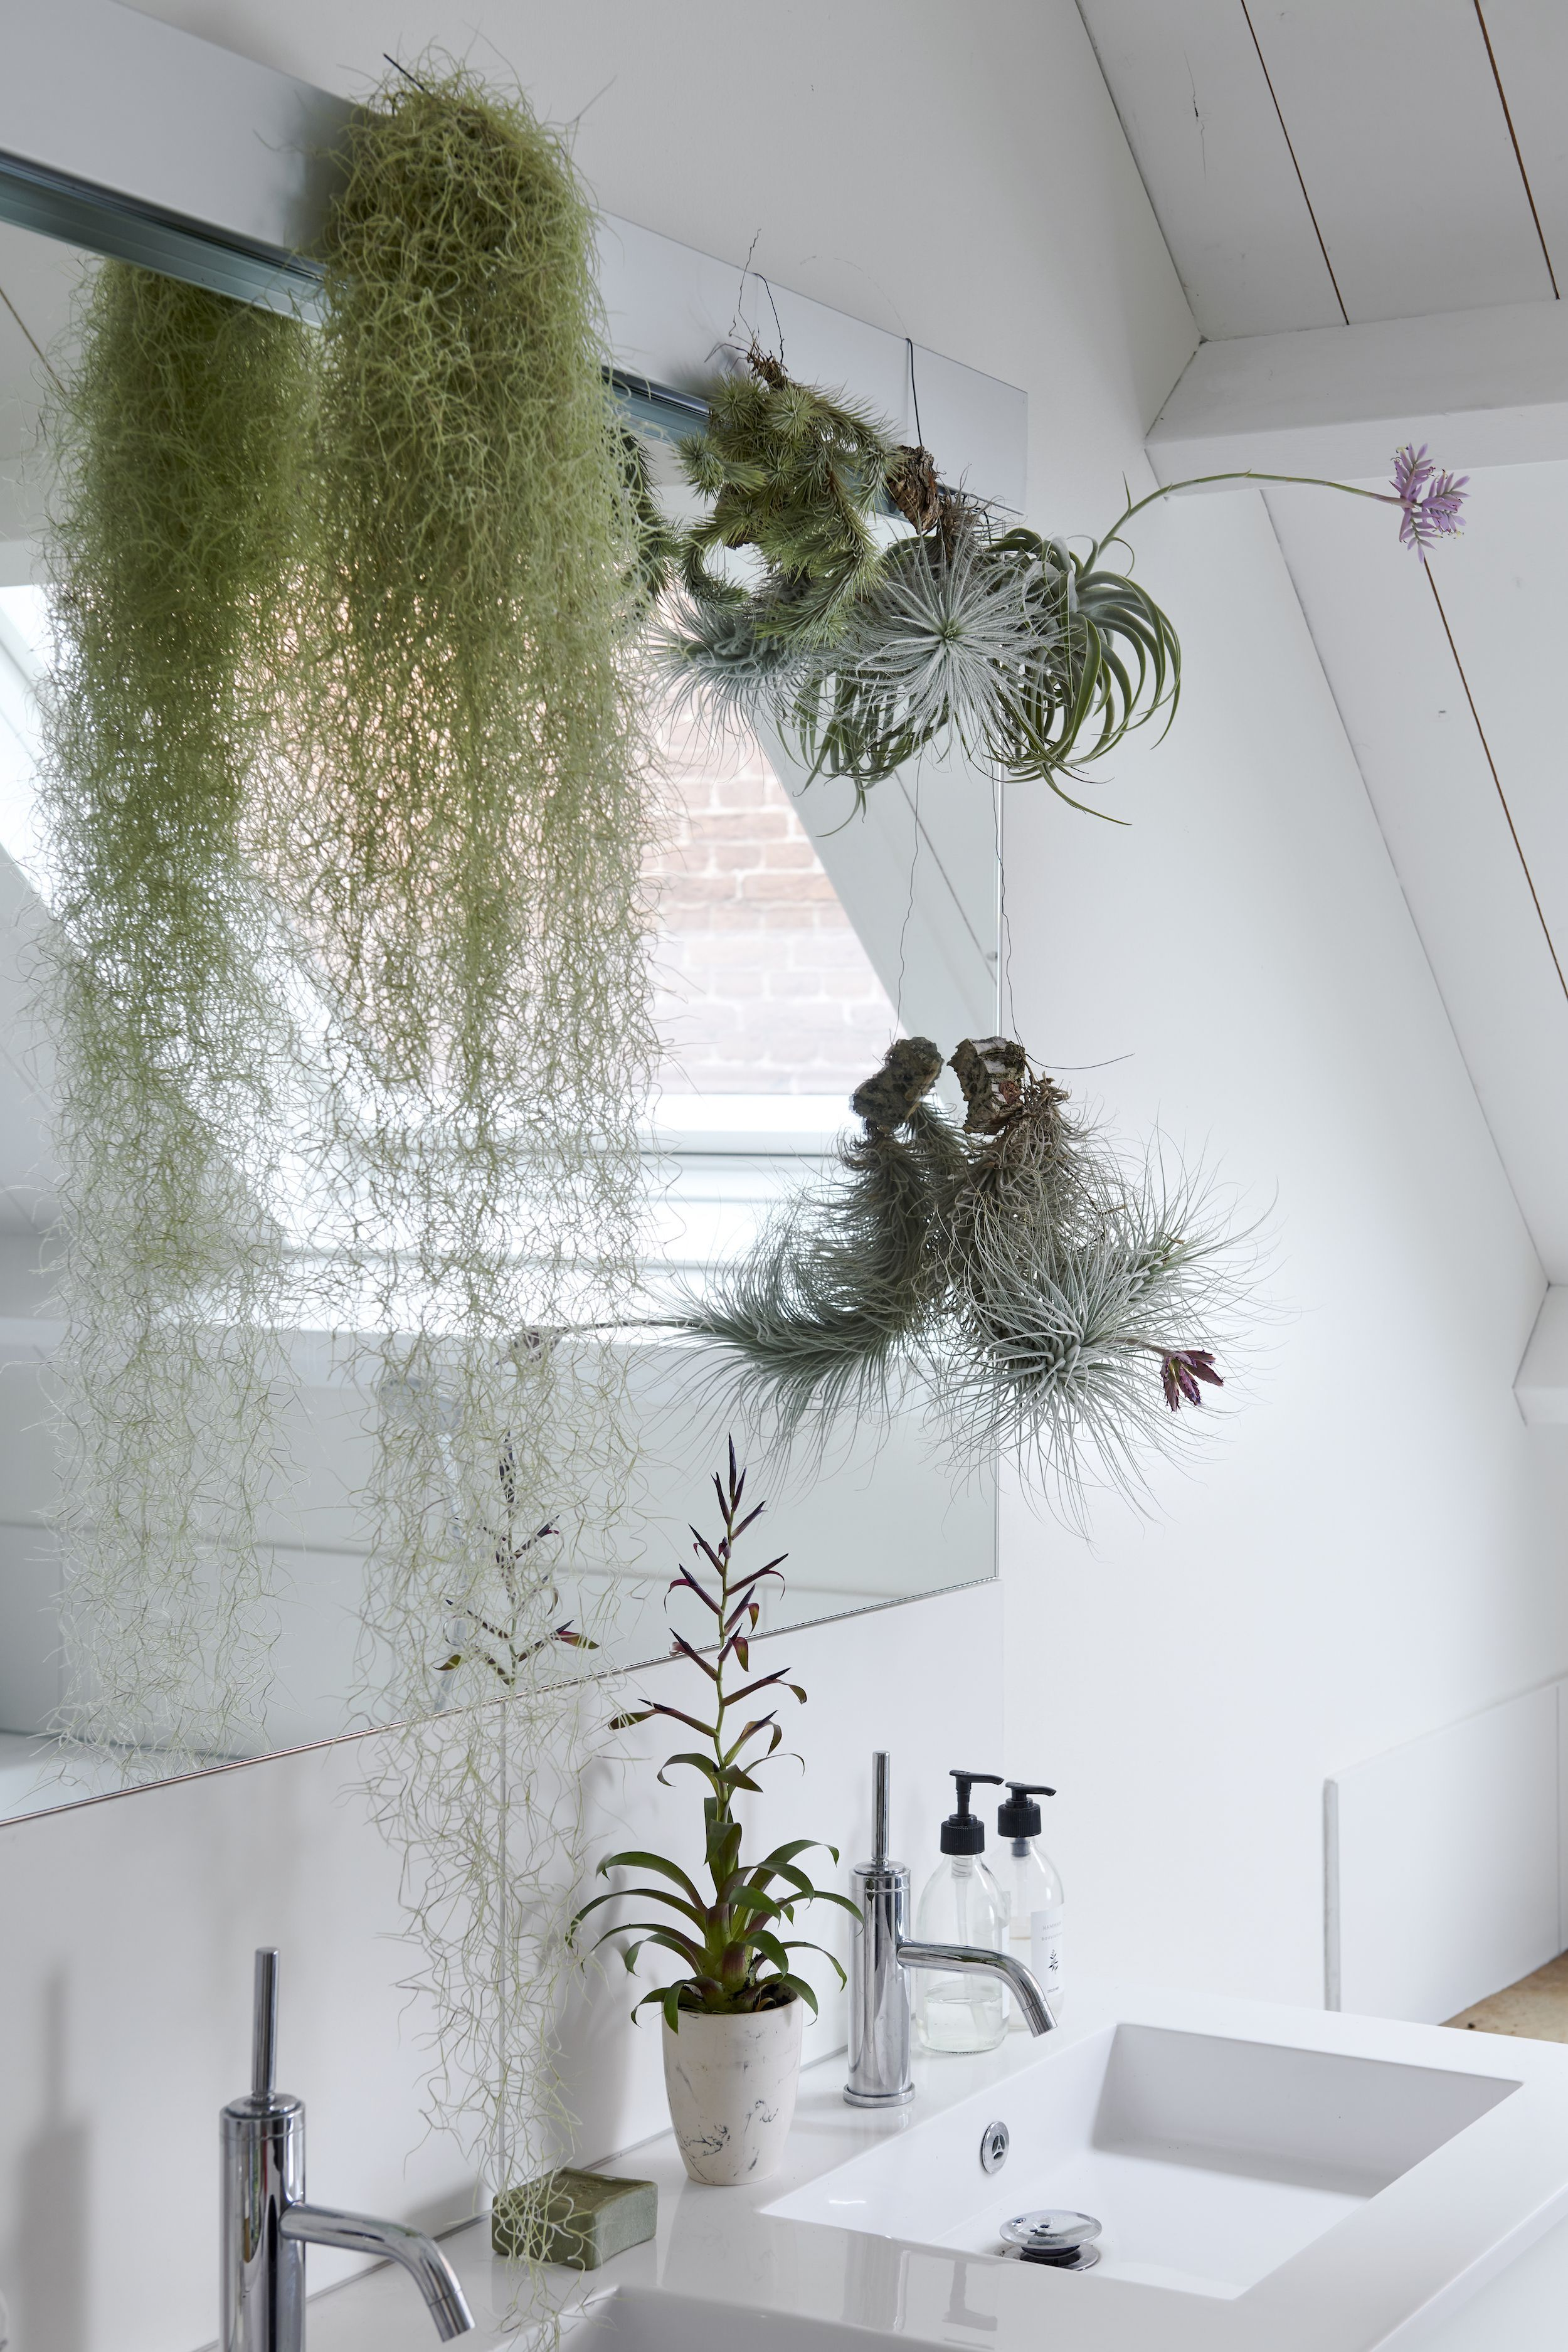 Bathrooms plants - A variation of Tillandsia in the bathroom